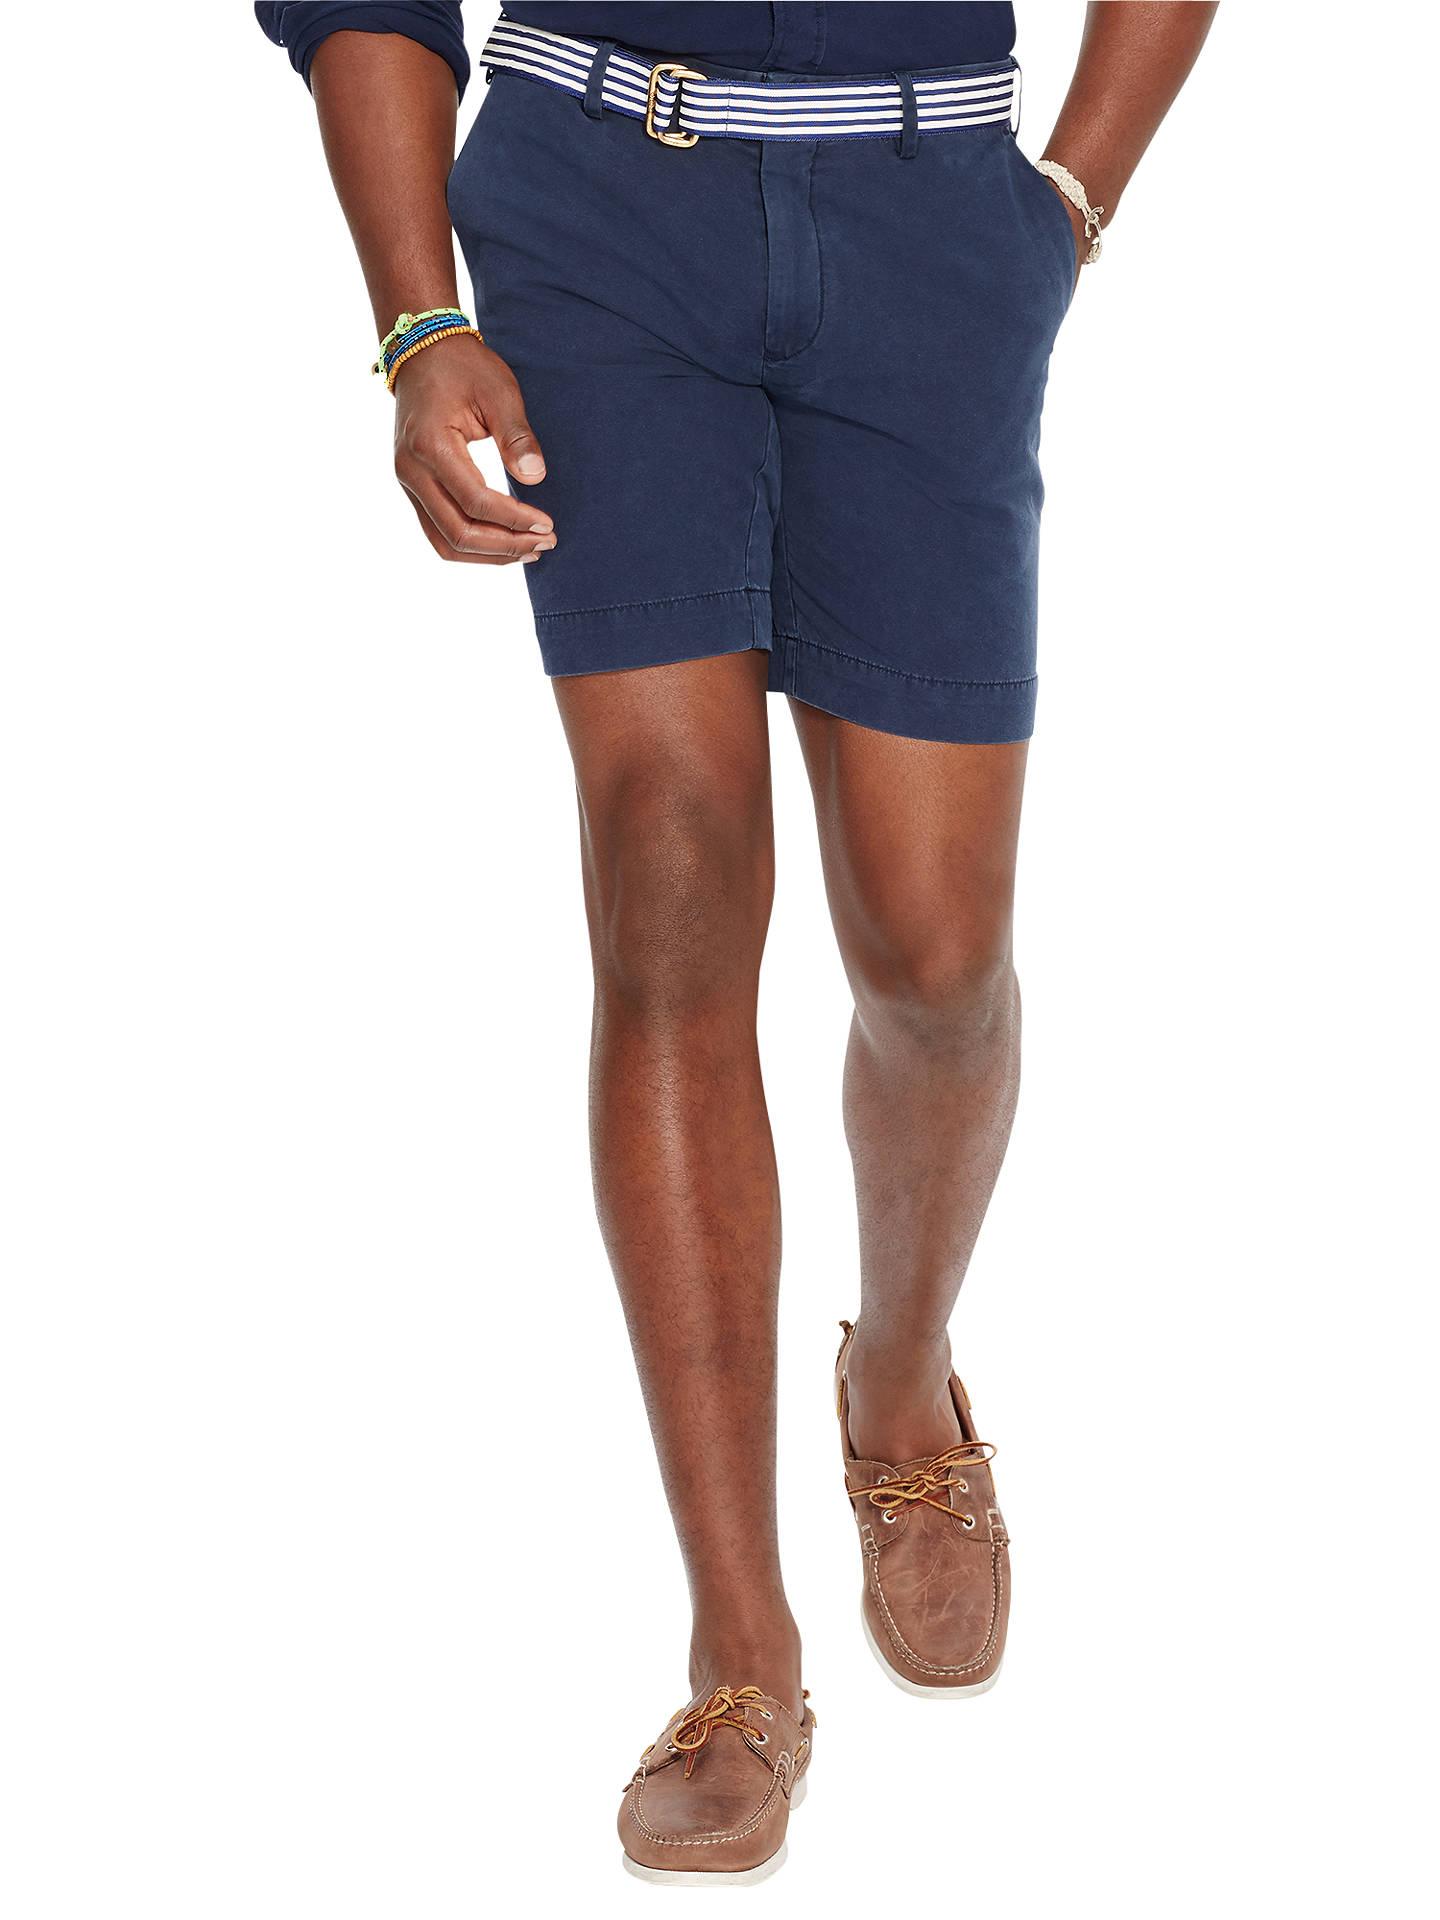 8b9e8fbf29 Polo Ralph Lauren Straight Fit Newport Shorts at John Lewis & Partners